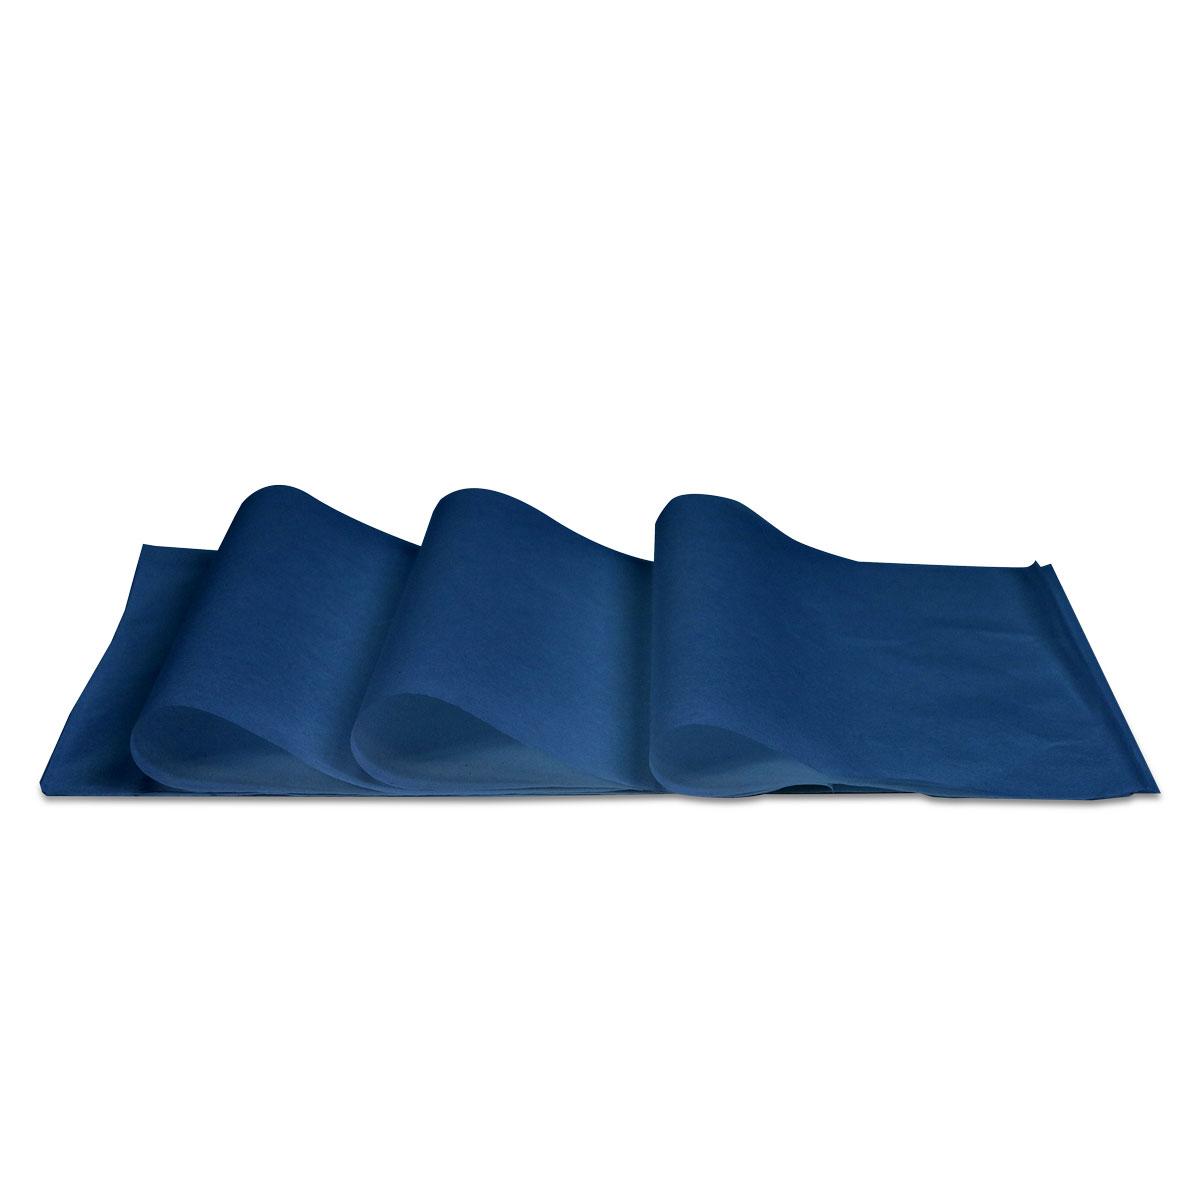 Vloeipapier - Blauw